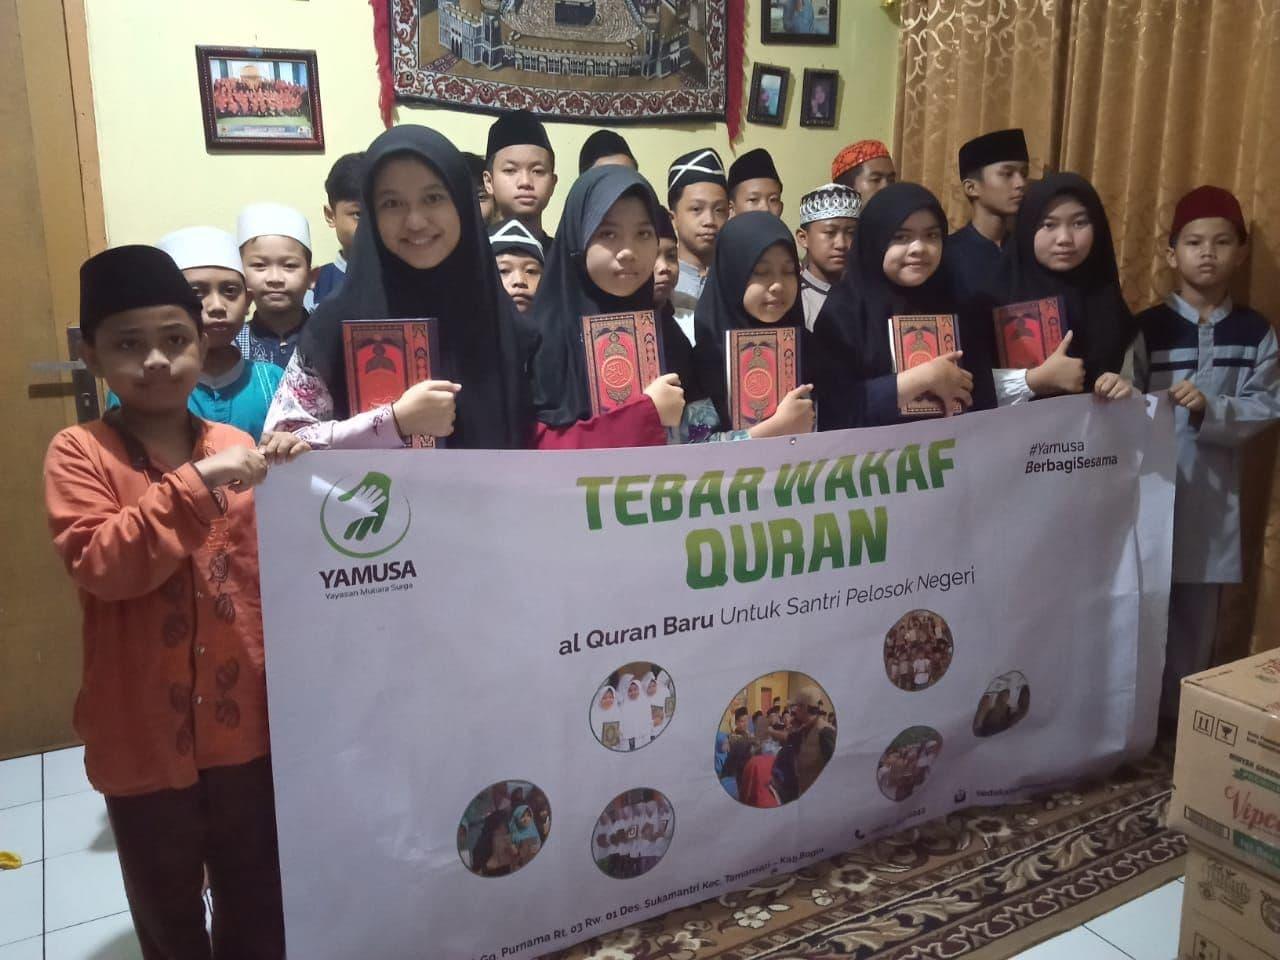 Paket Mushaf untuk Santri Madrasah Al Wasi'ah Bandung